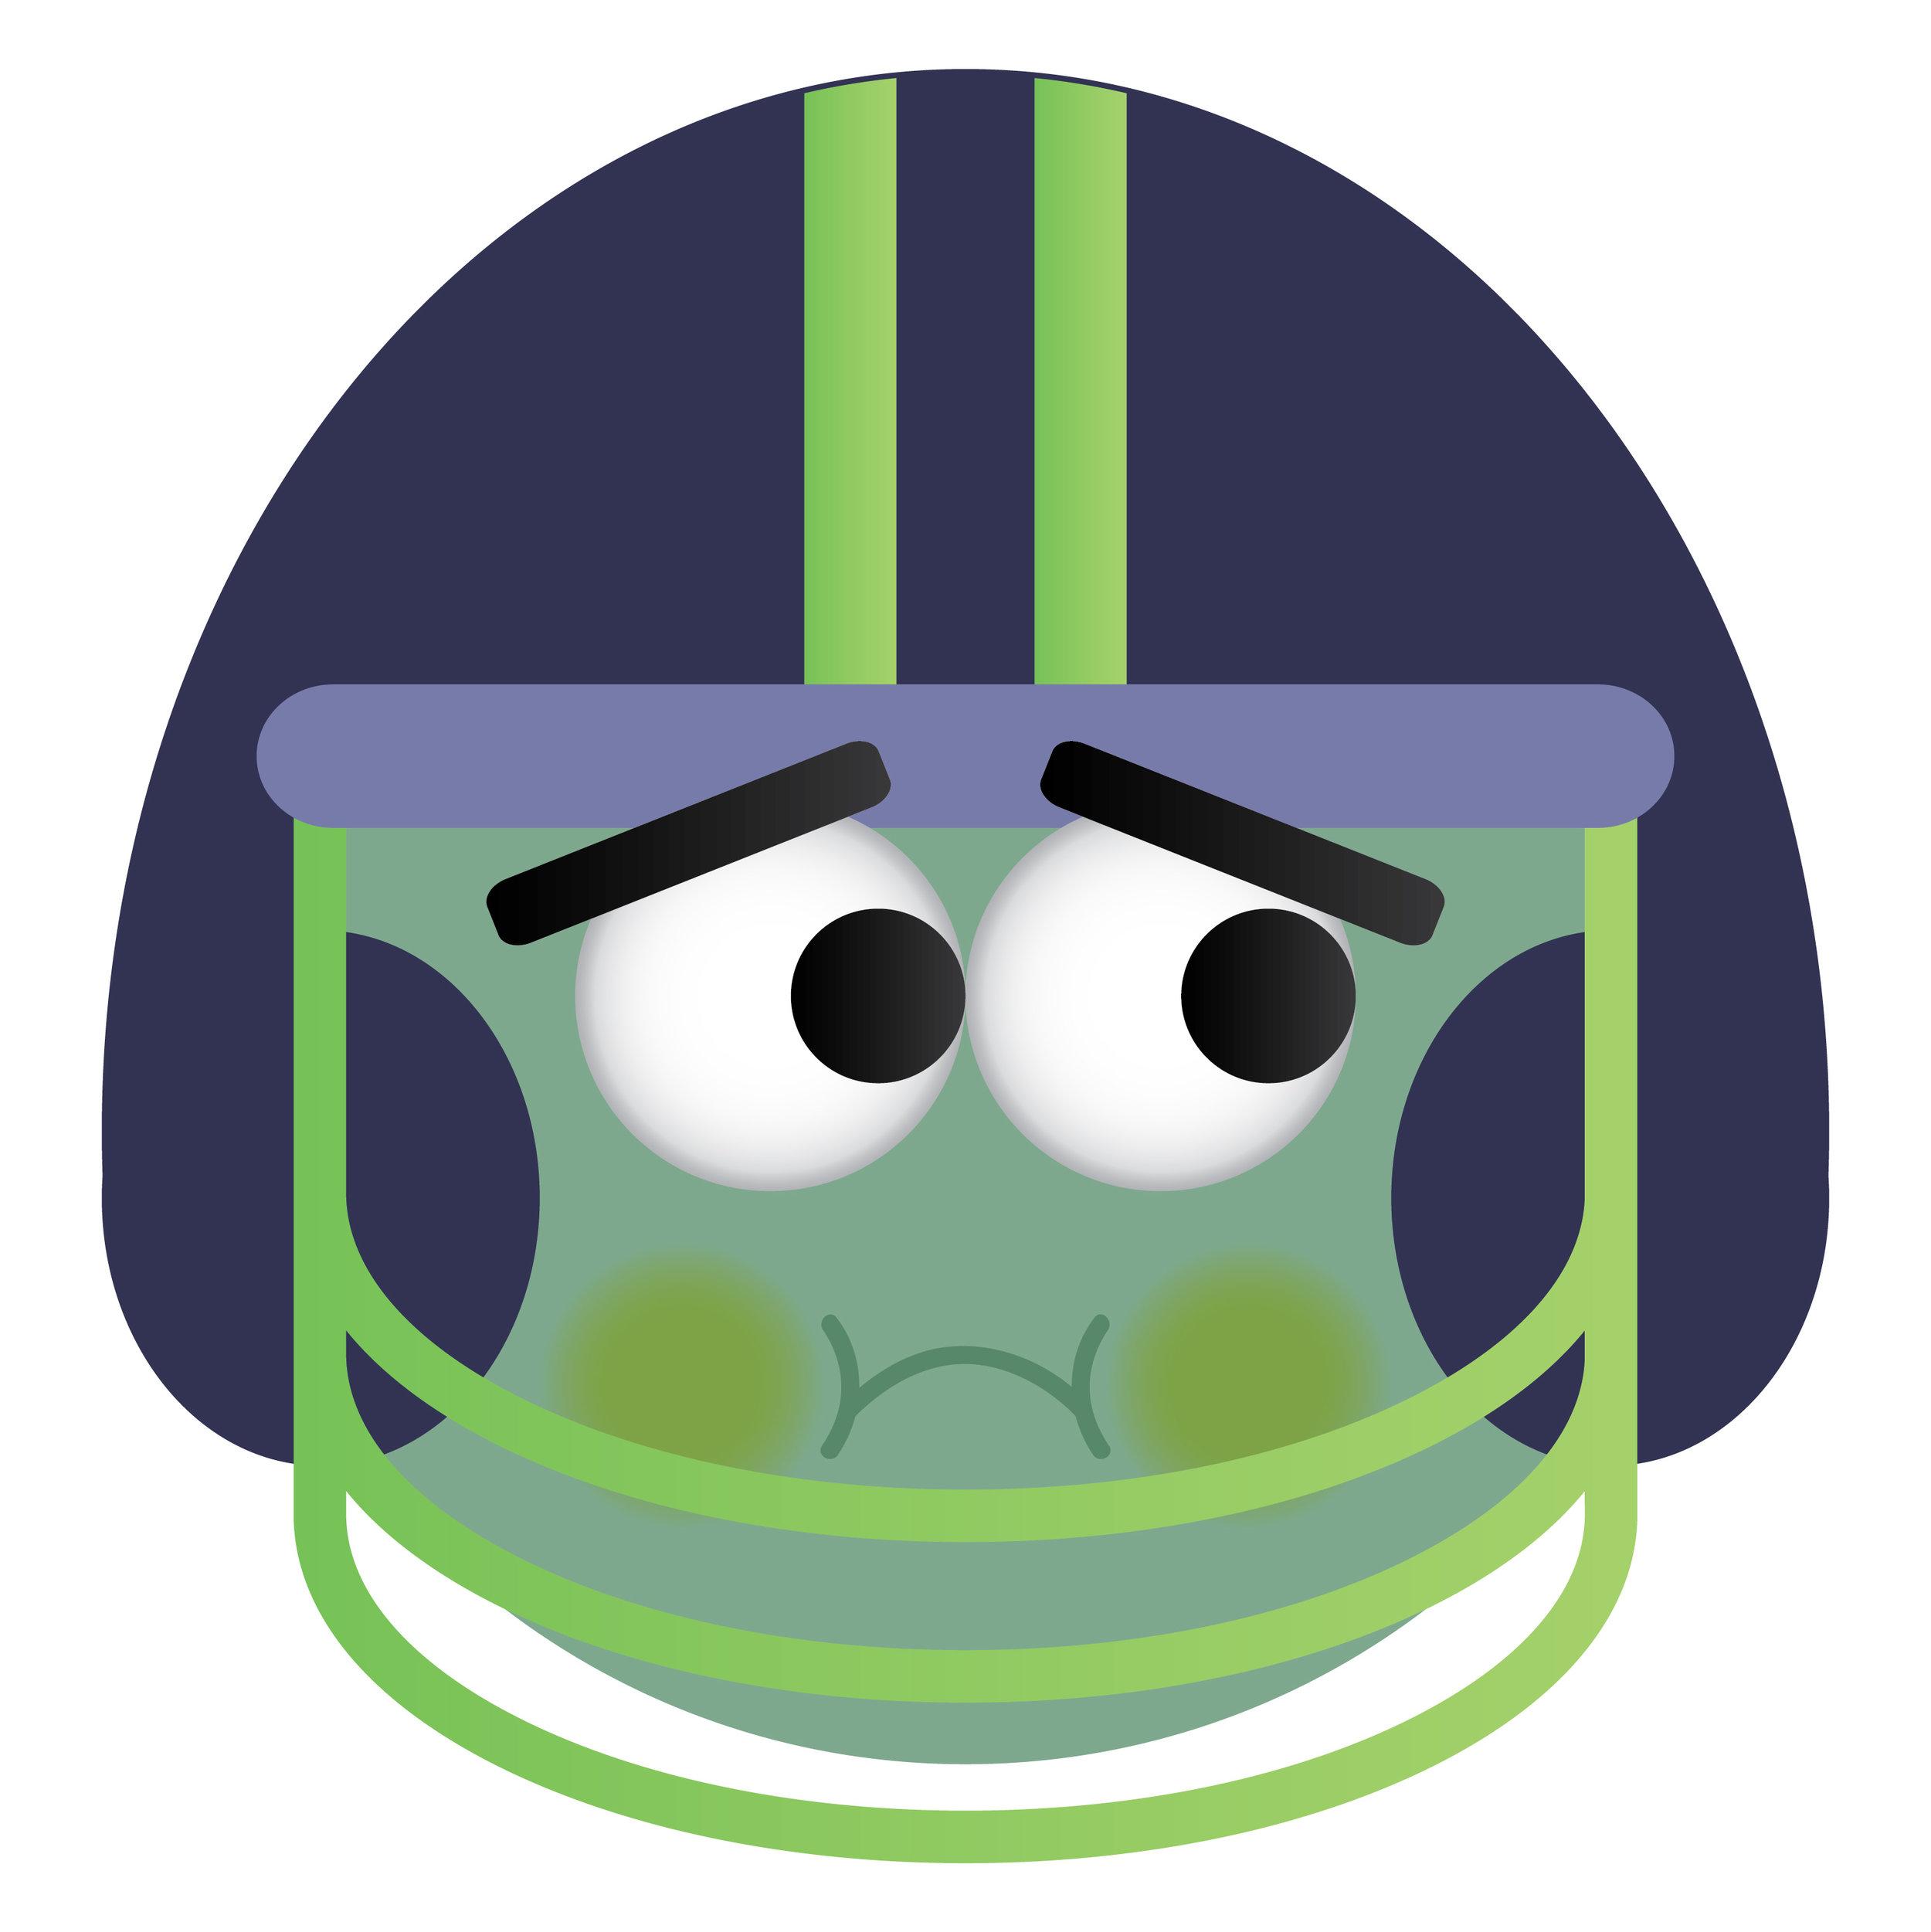 Emojis_Fall2018 [Recovered]_DM_Emoji_9.jpg